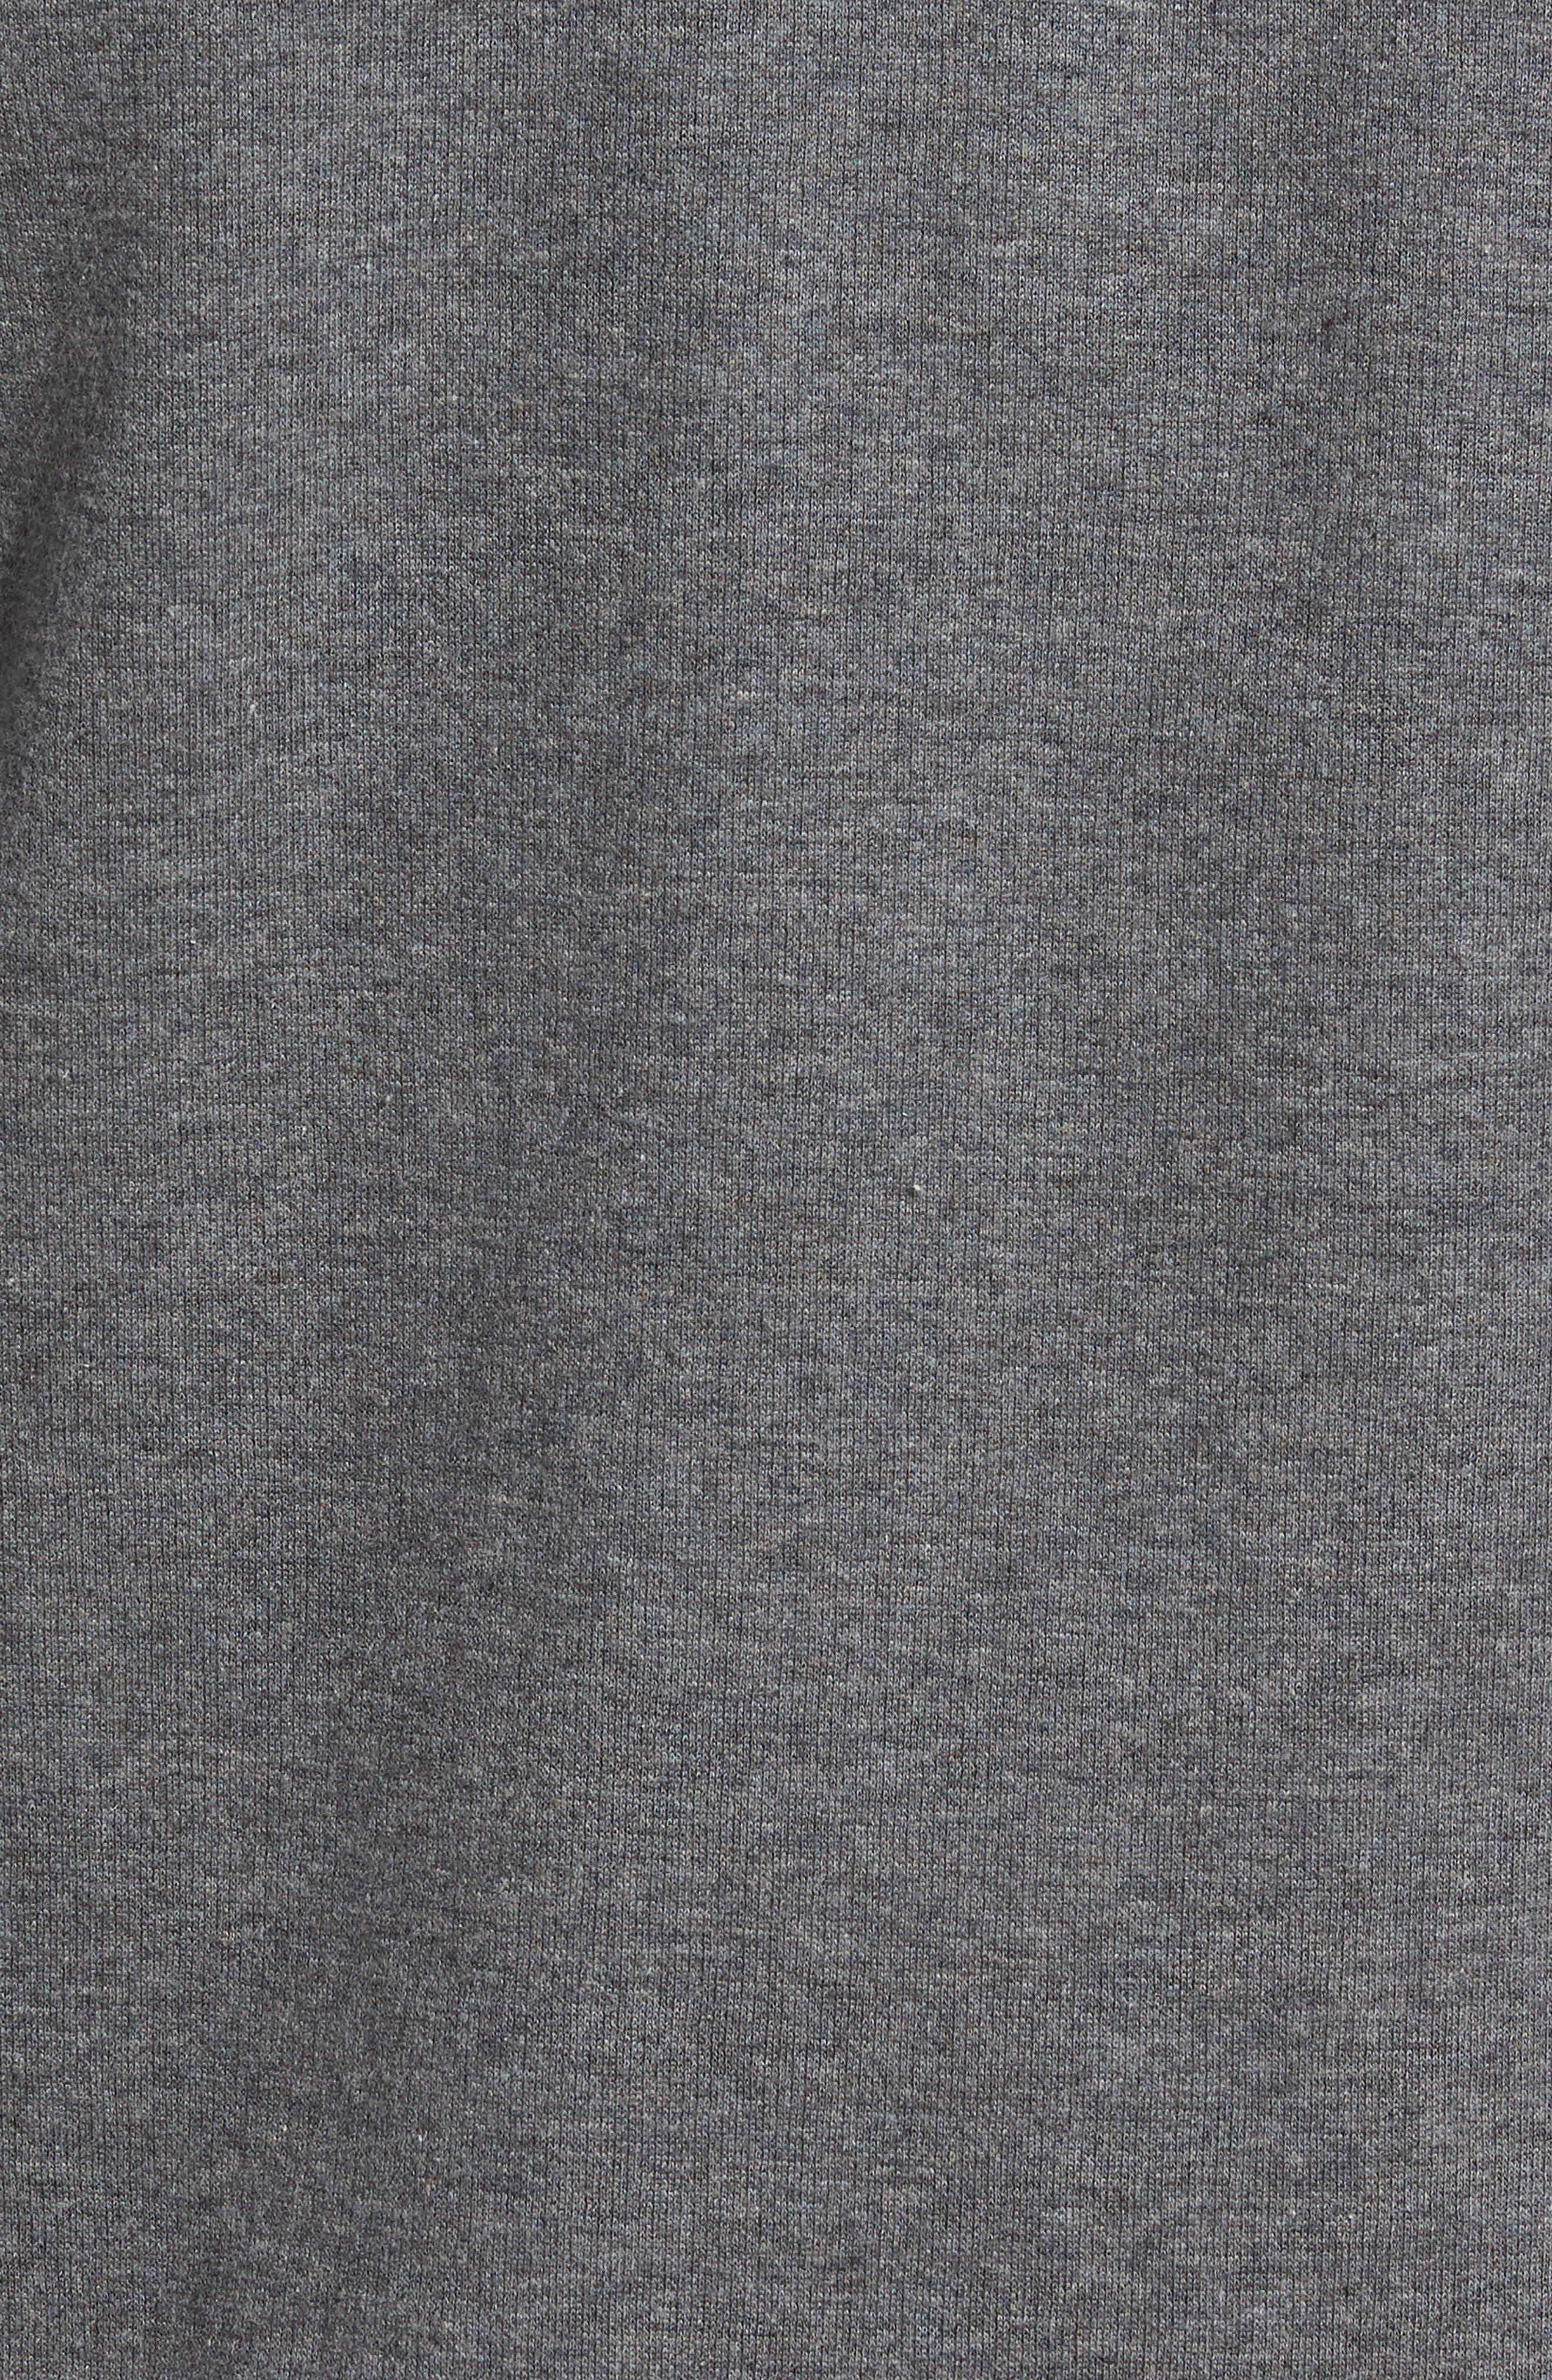 Full Zip Fleece Jacket,                             Alternate thumbnail 5, color,                             Charcoal Heather